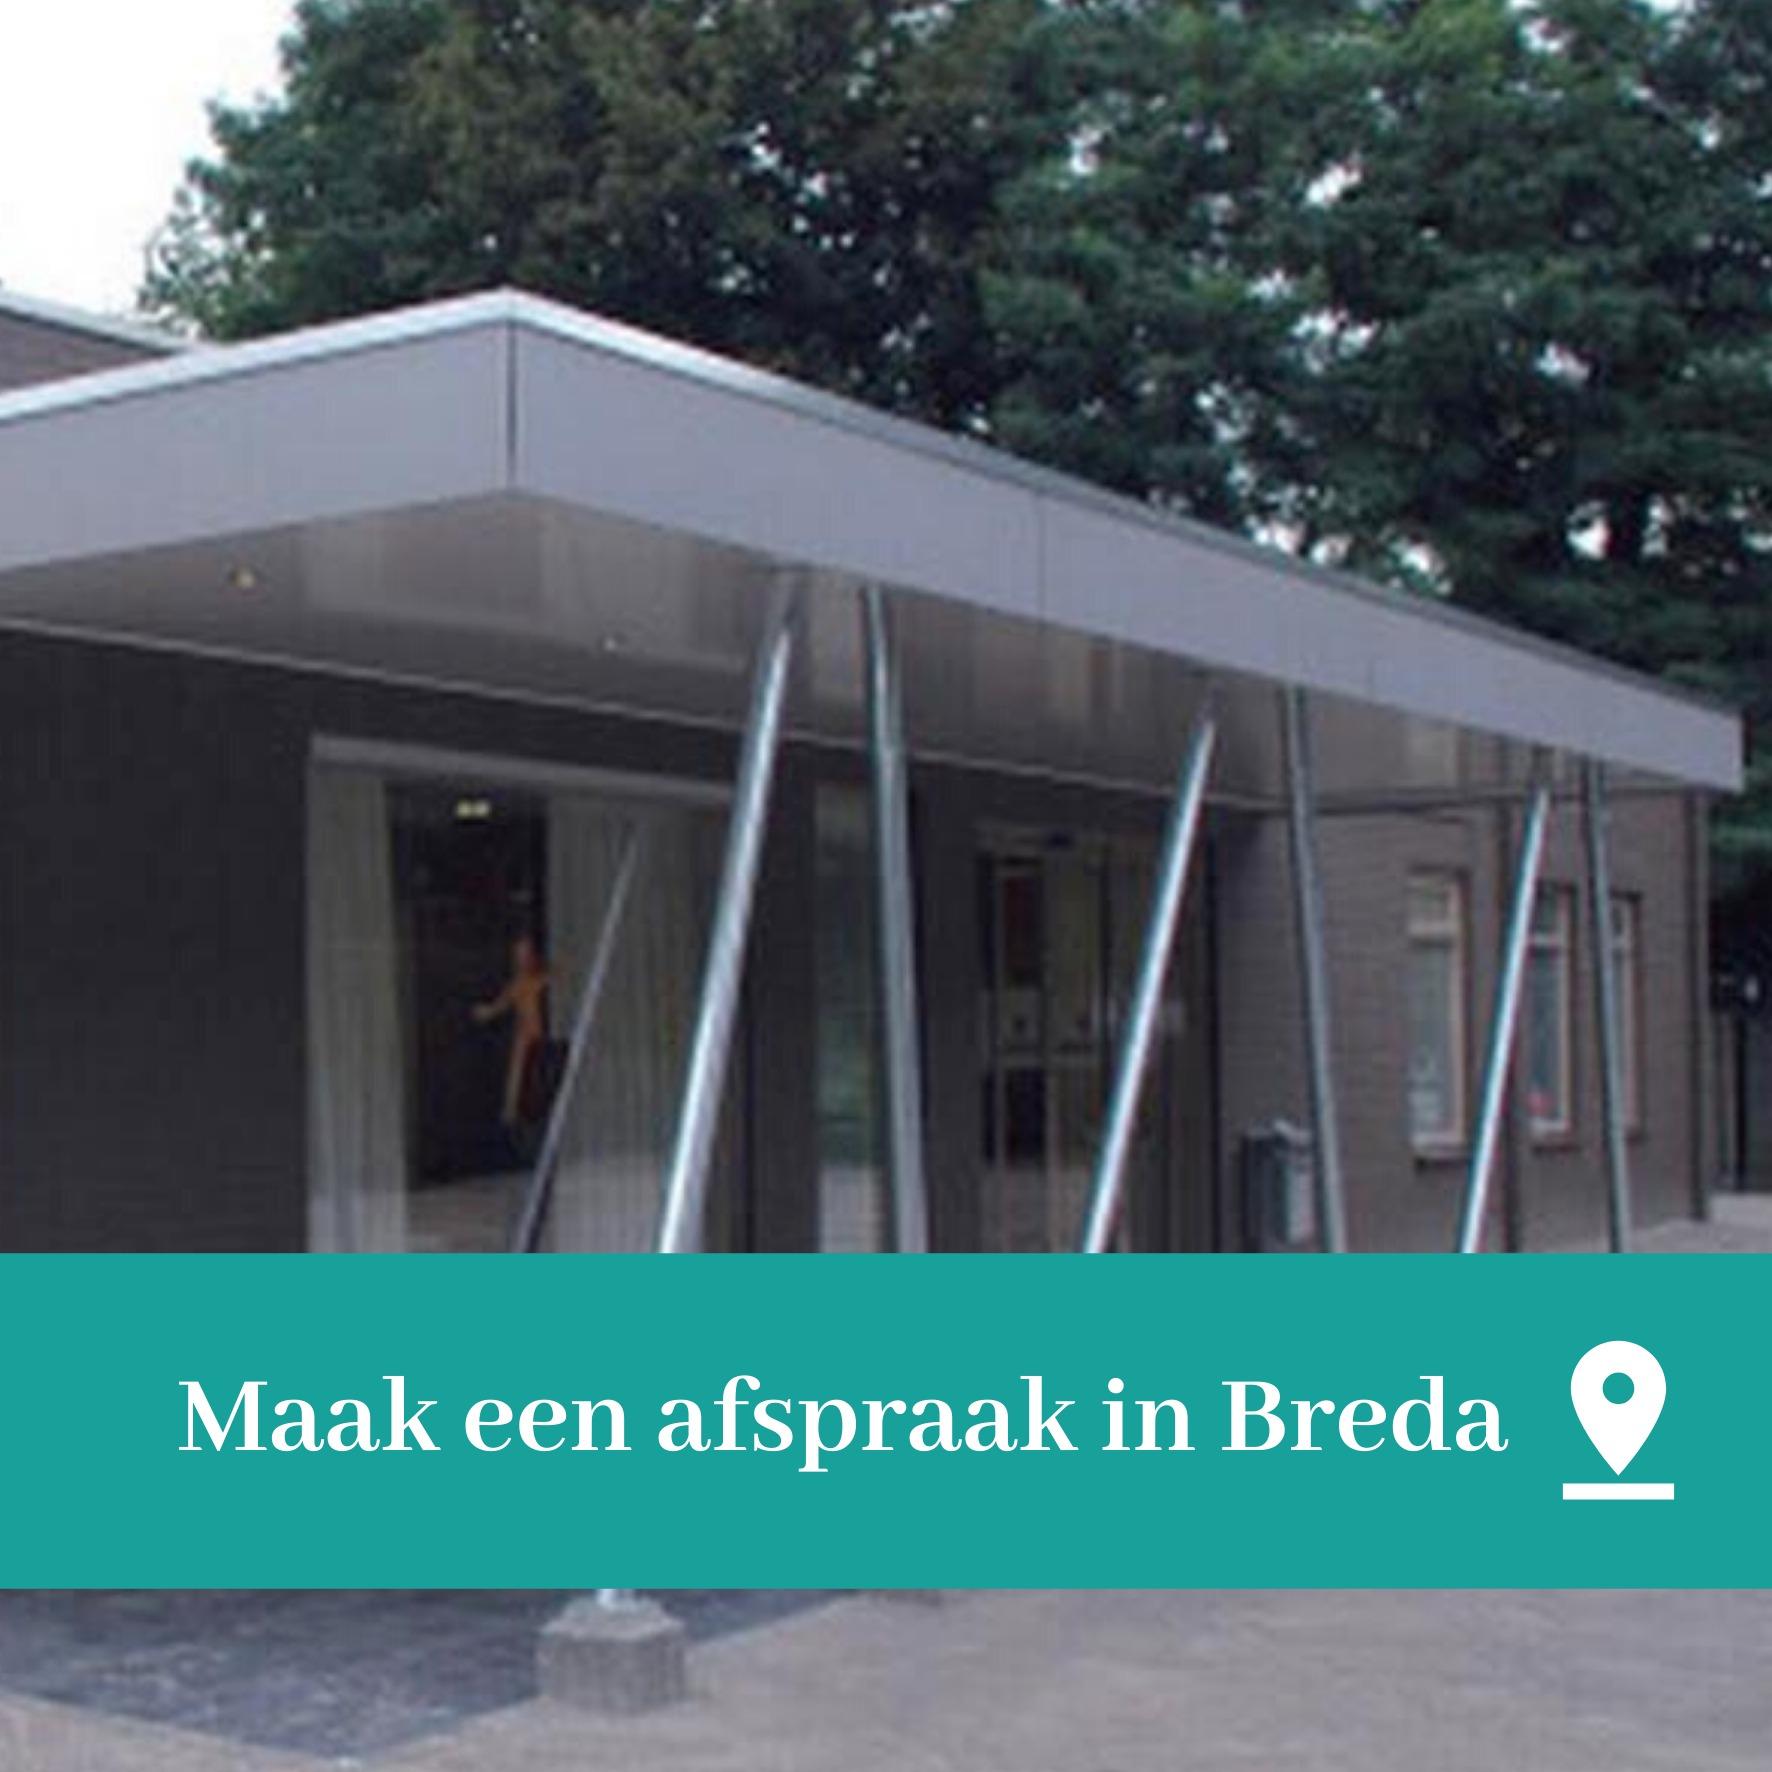 besnijdenis kliniek Breda